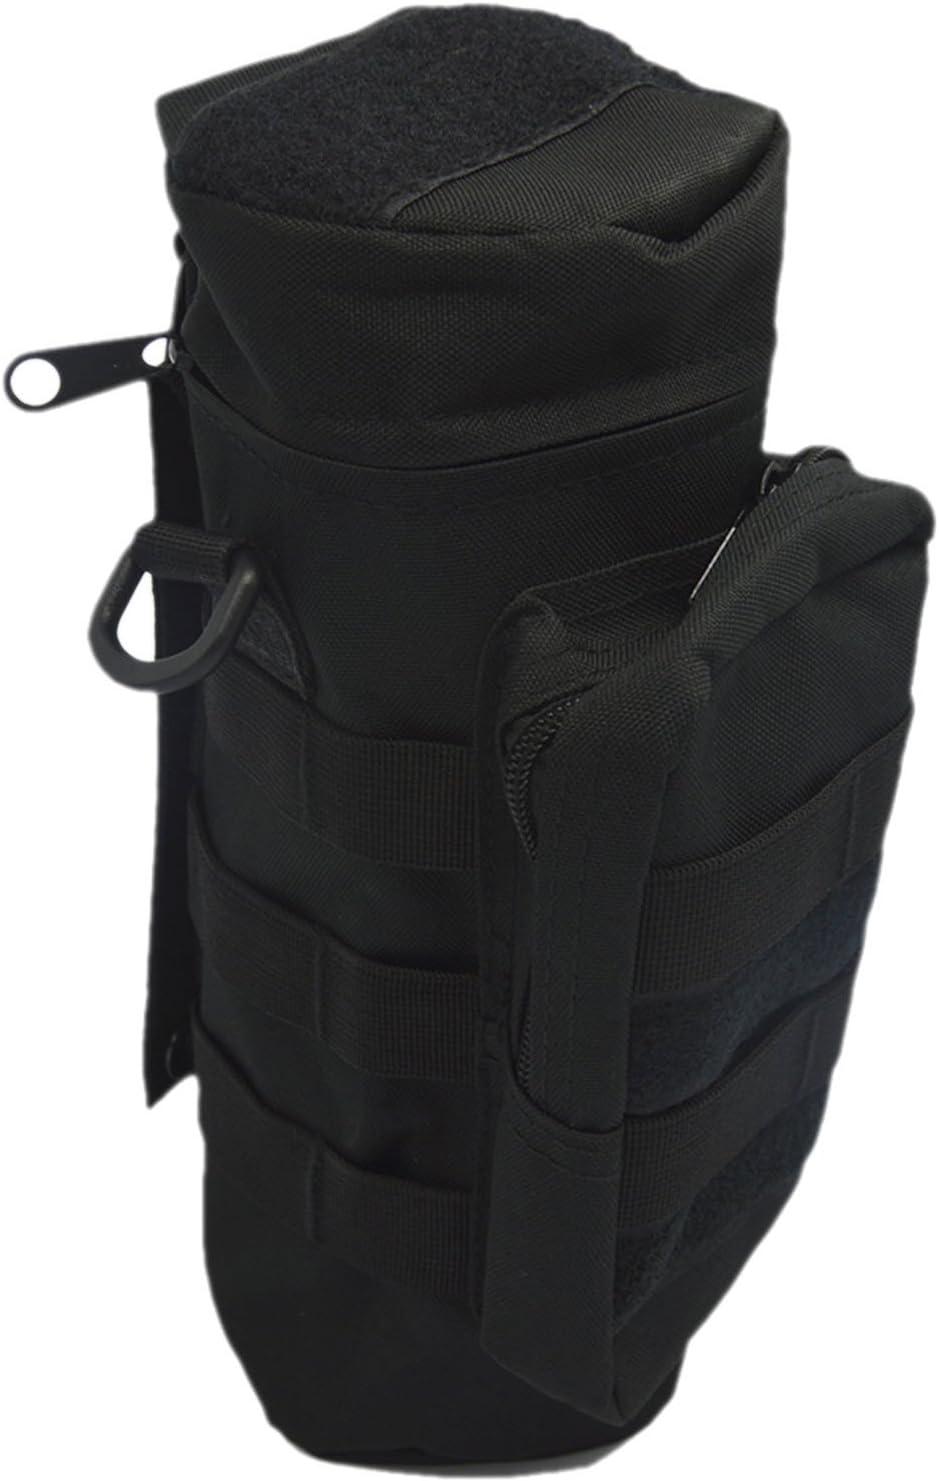 Deporte al aire libre engranaje táctico Nylon cremallera Molle Camo botella grande de agua caldera paquete del bolso con lío bolsa verde del ejército